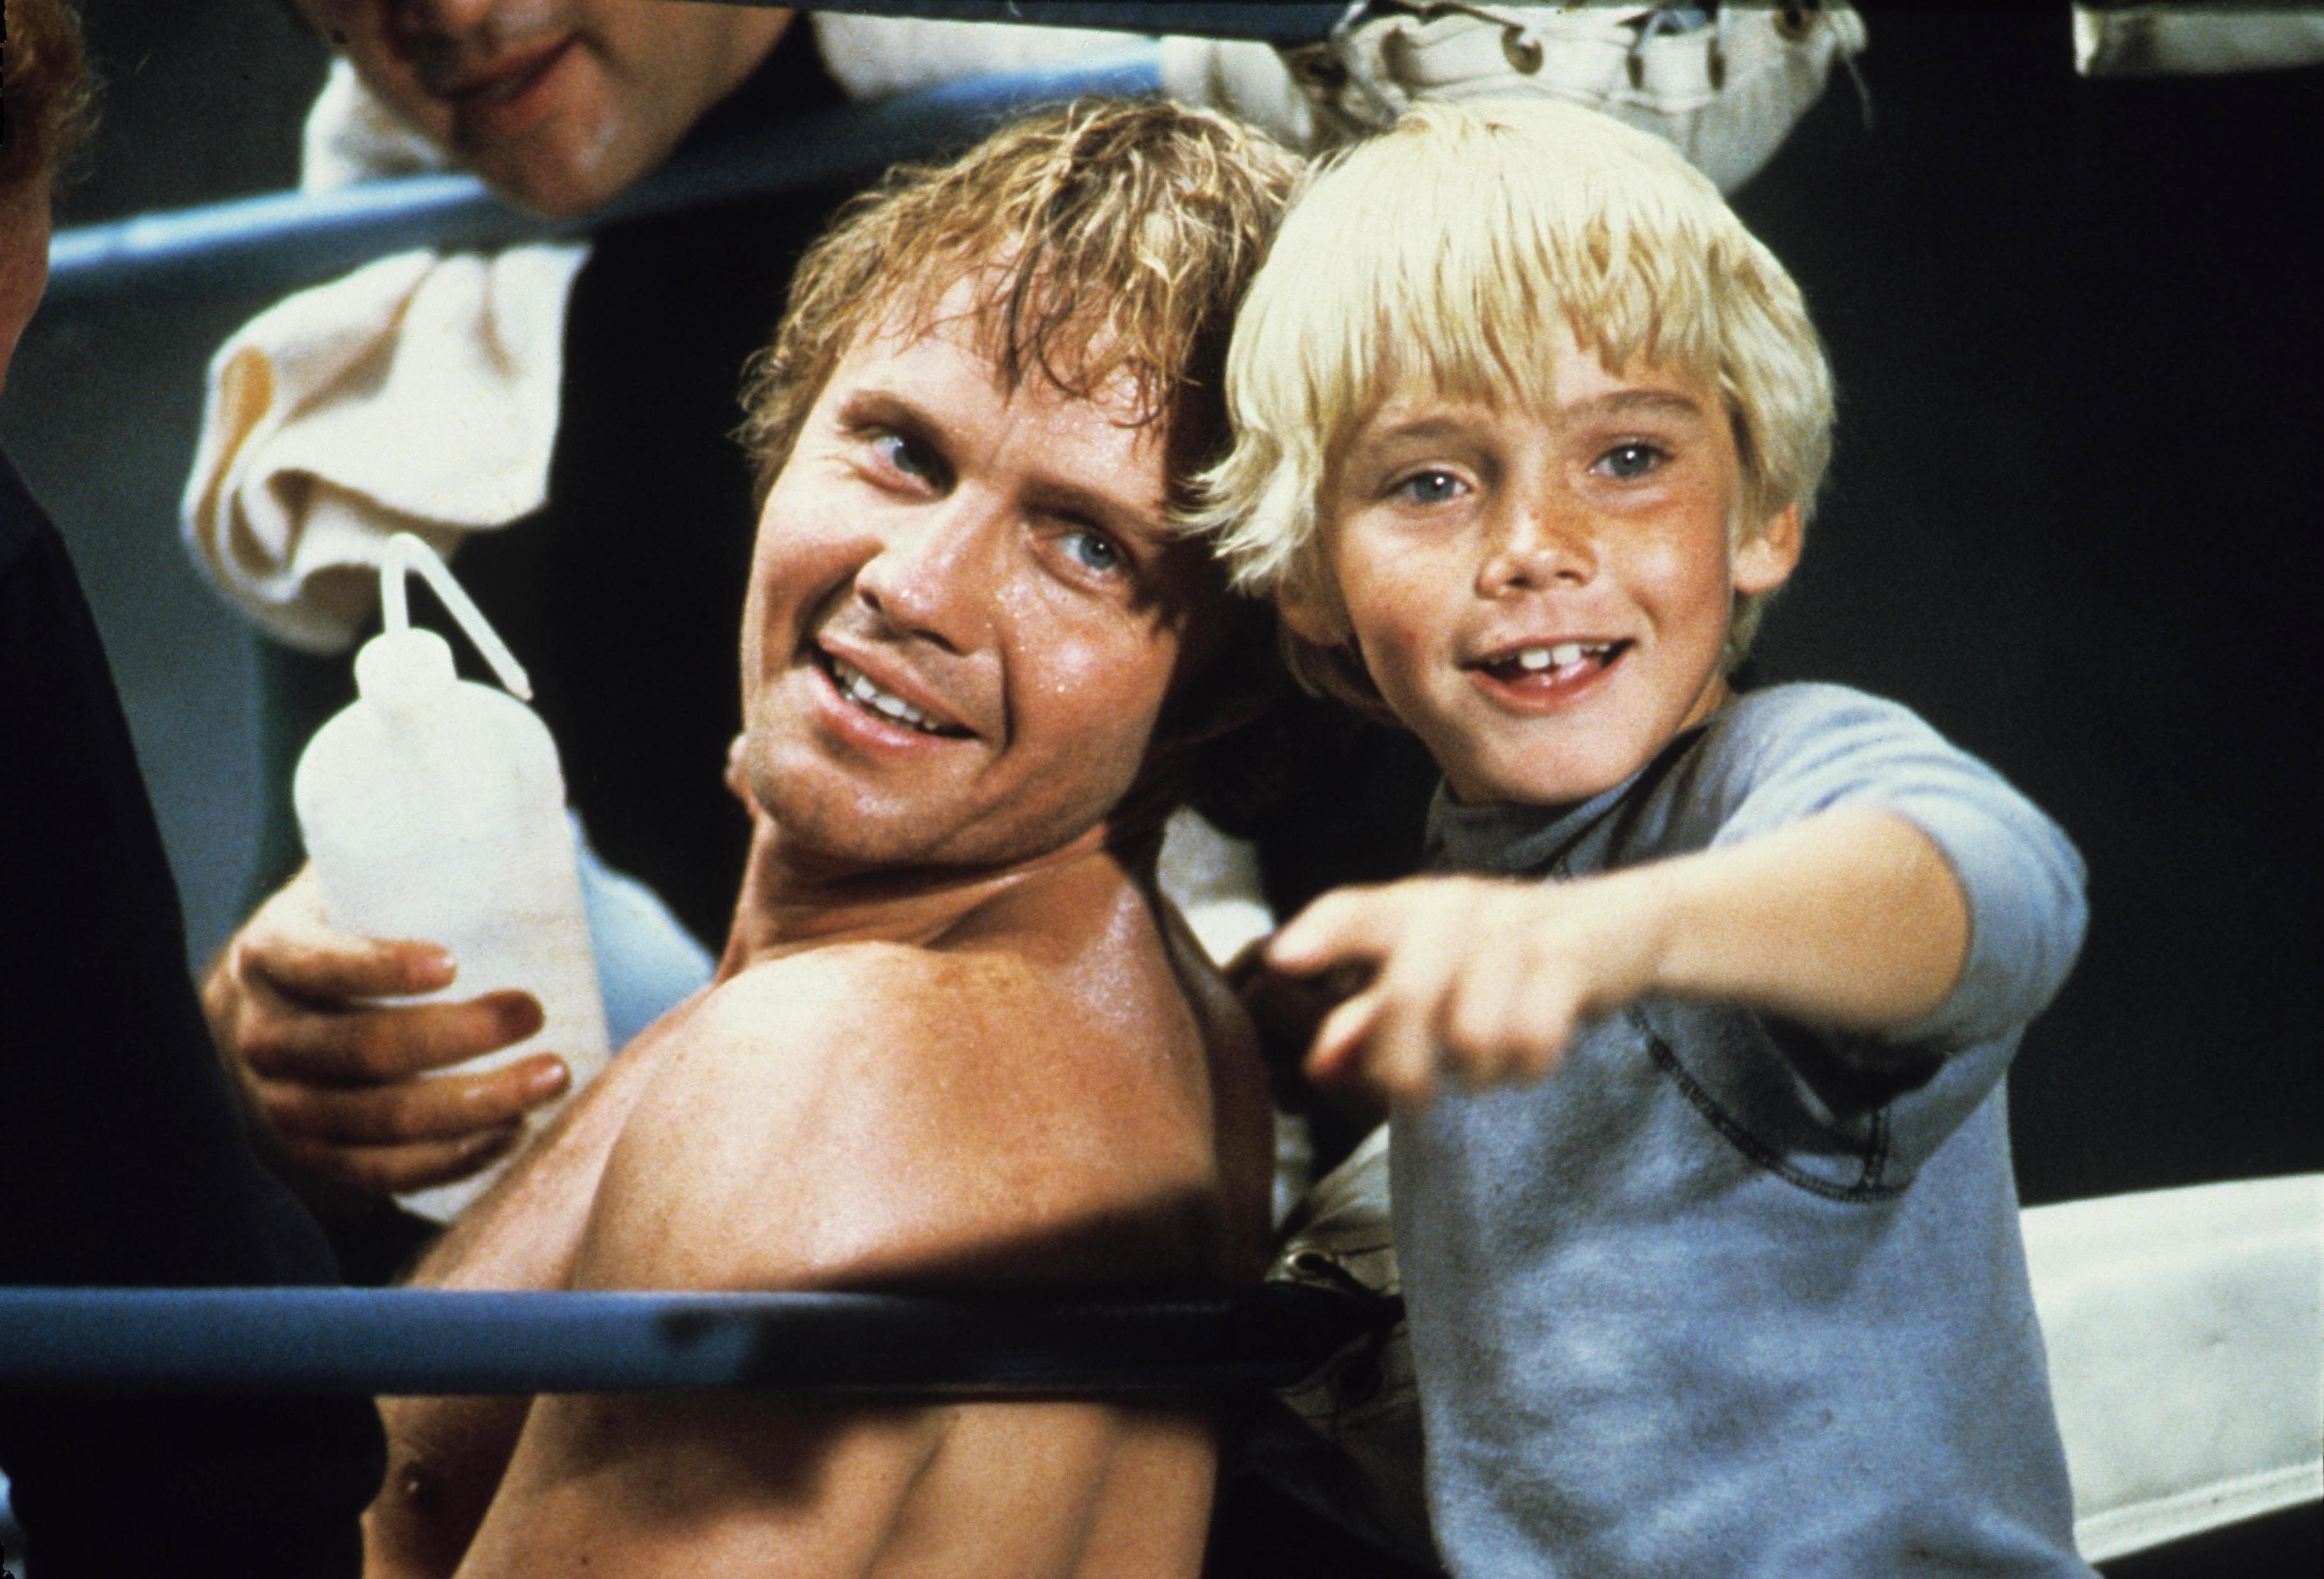 Saddest movie scene - The Champ (1979)